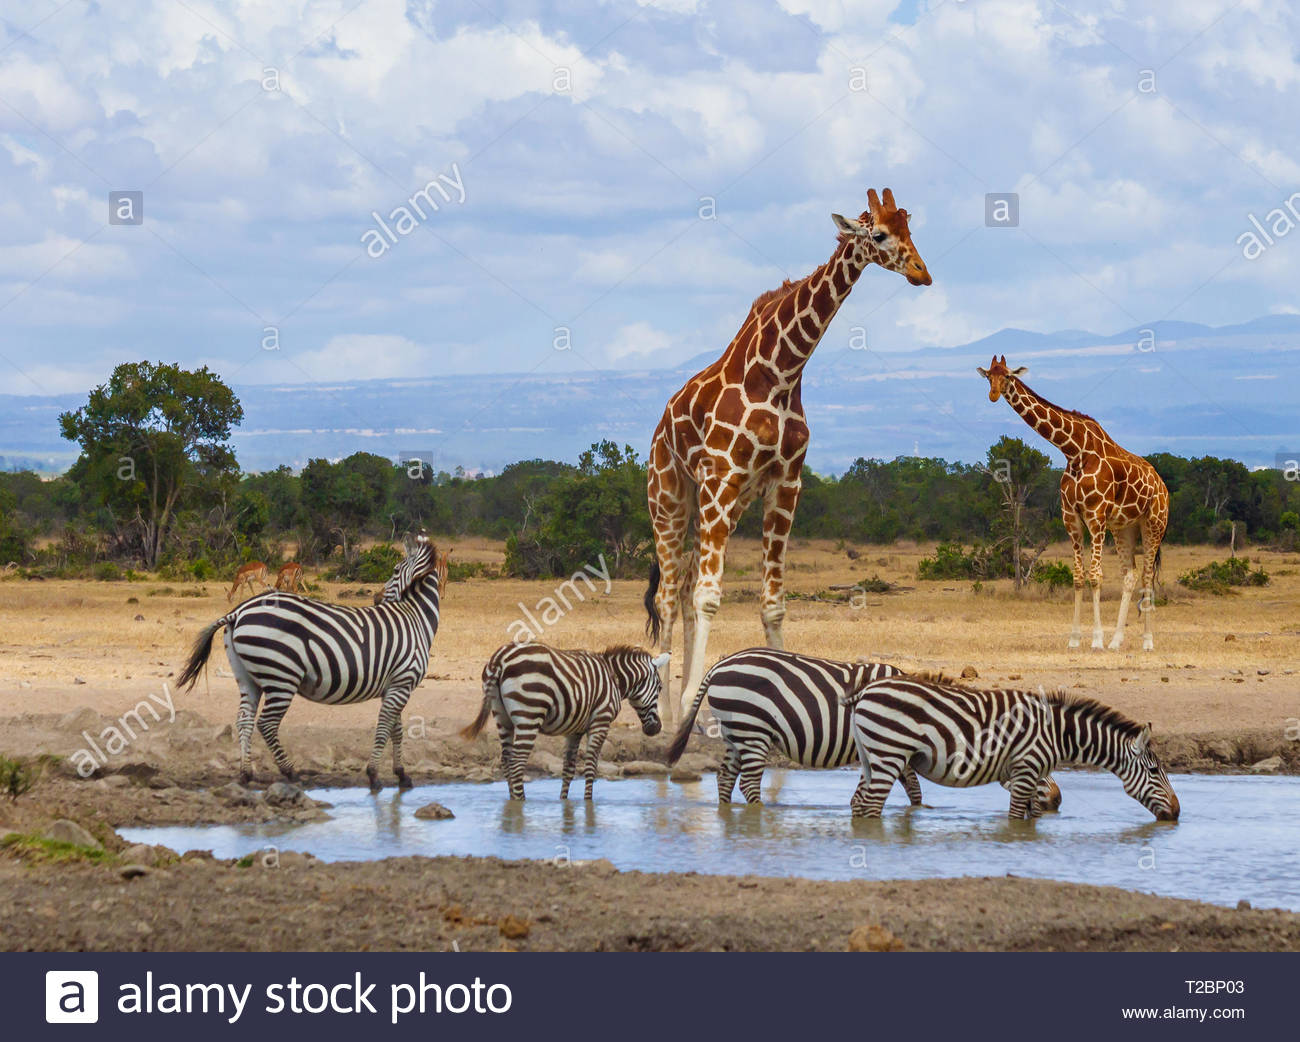 Two giraffe four zebra queueing and drinking at waterhole Ol Pejeta Conservancy Kenya Stock Photo